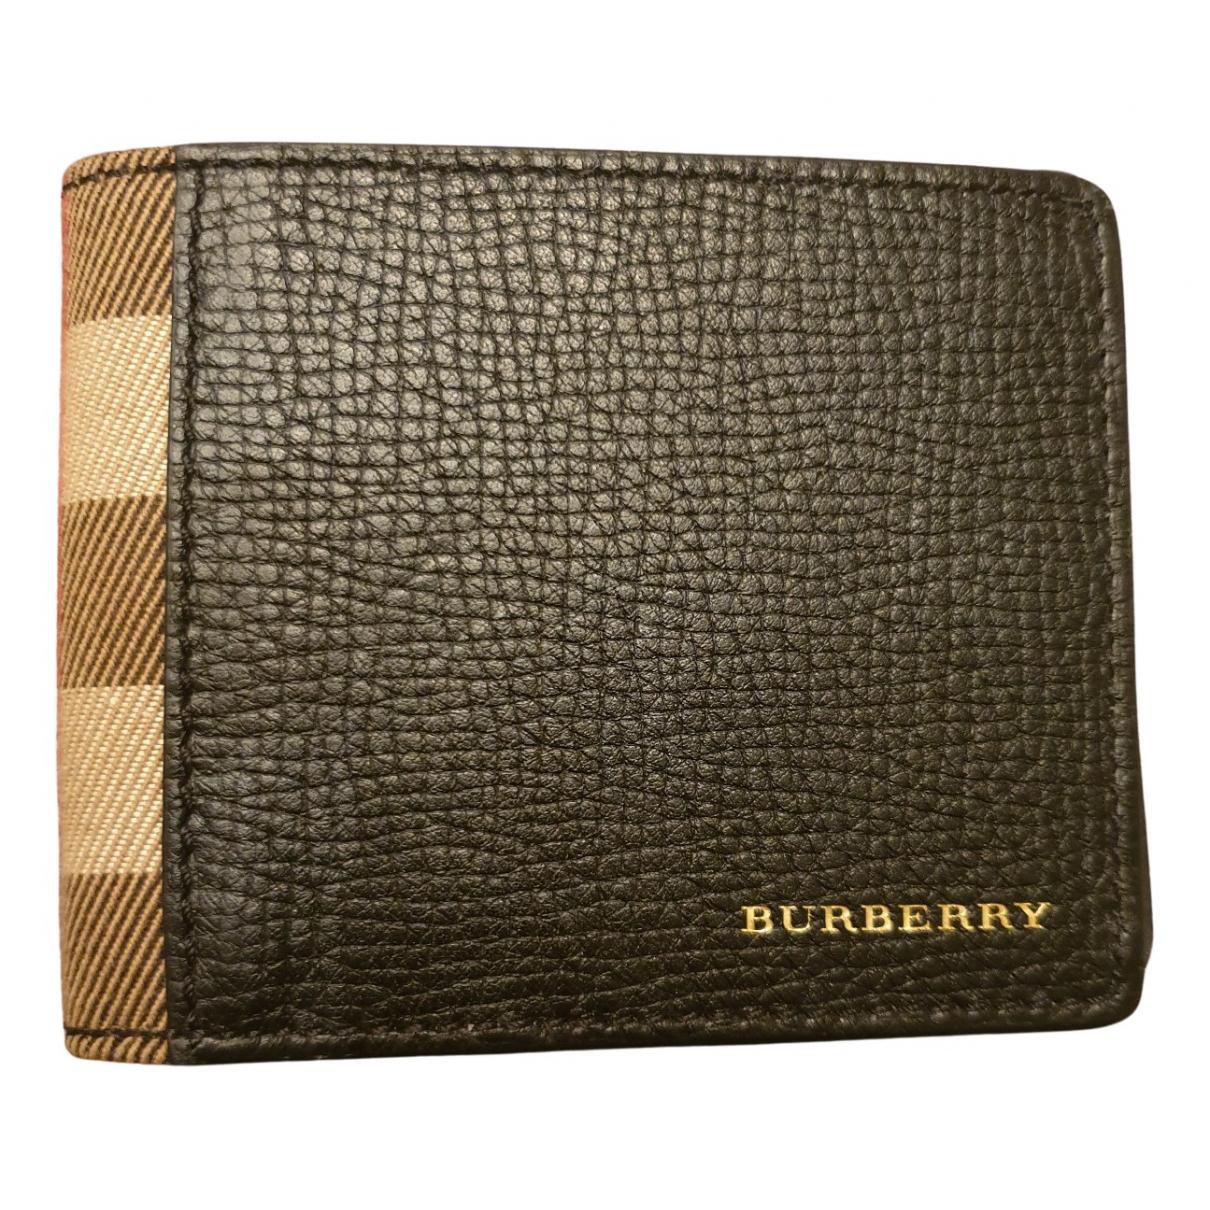 Marroquineria de Cuero Burberry